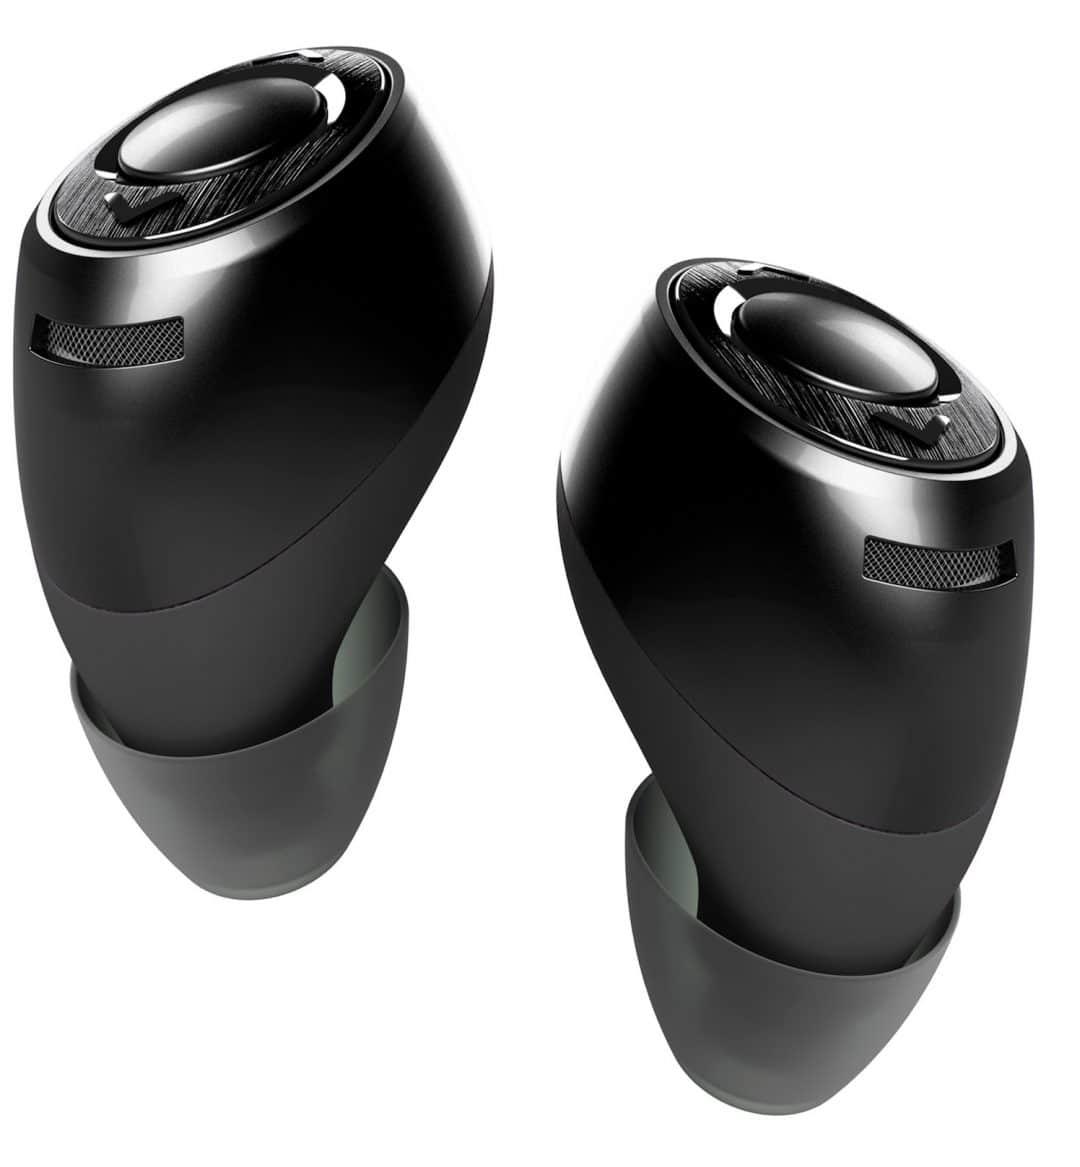 1cd49b14839 Avanca Minim True Wireless Earbuds - The Audiophile Man